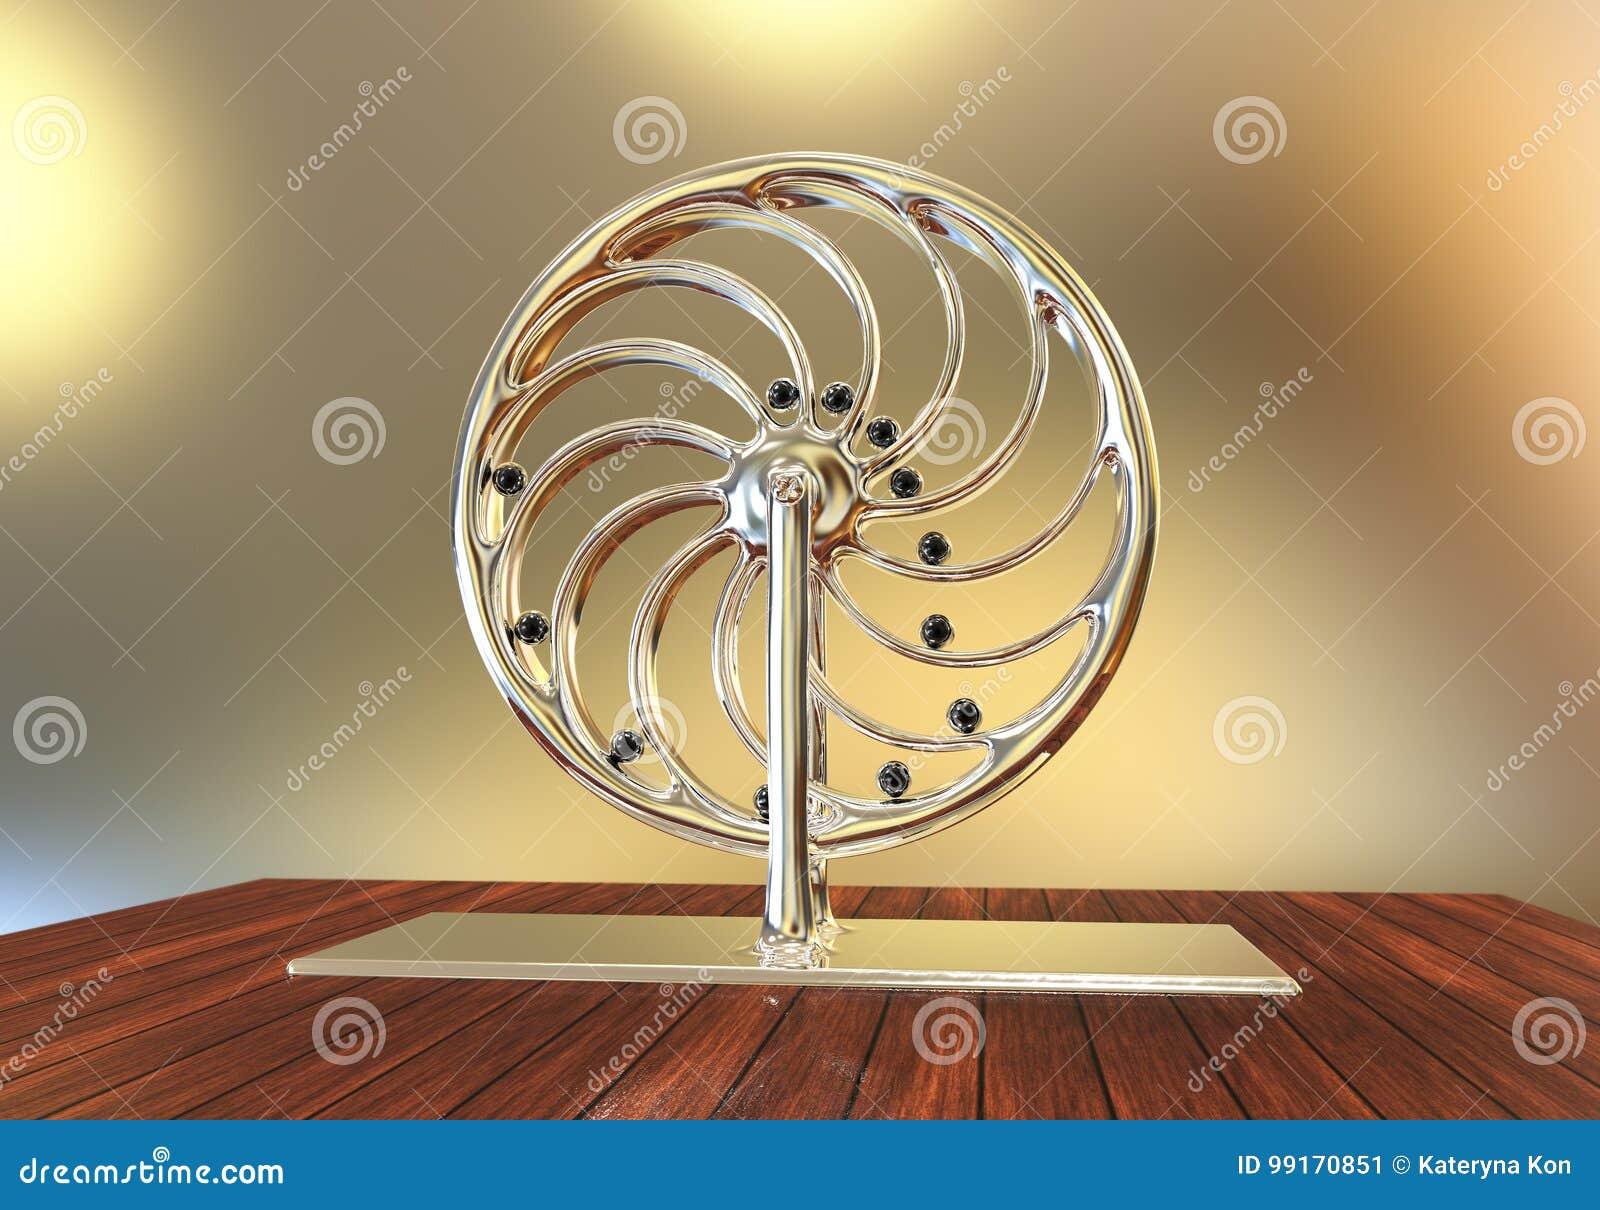 Perpetual Motion Machine, Perpetuum Mobile Stock ...